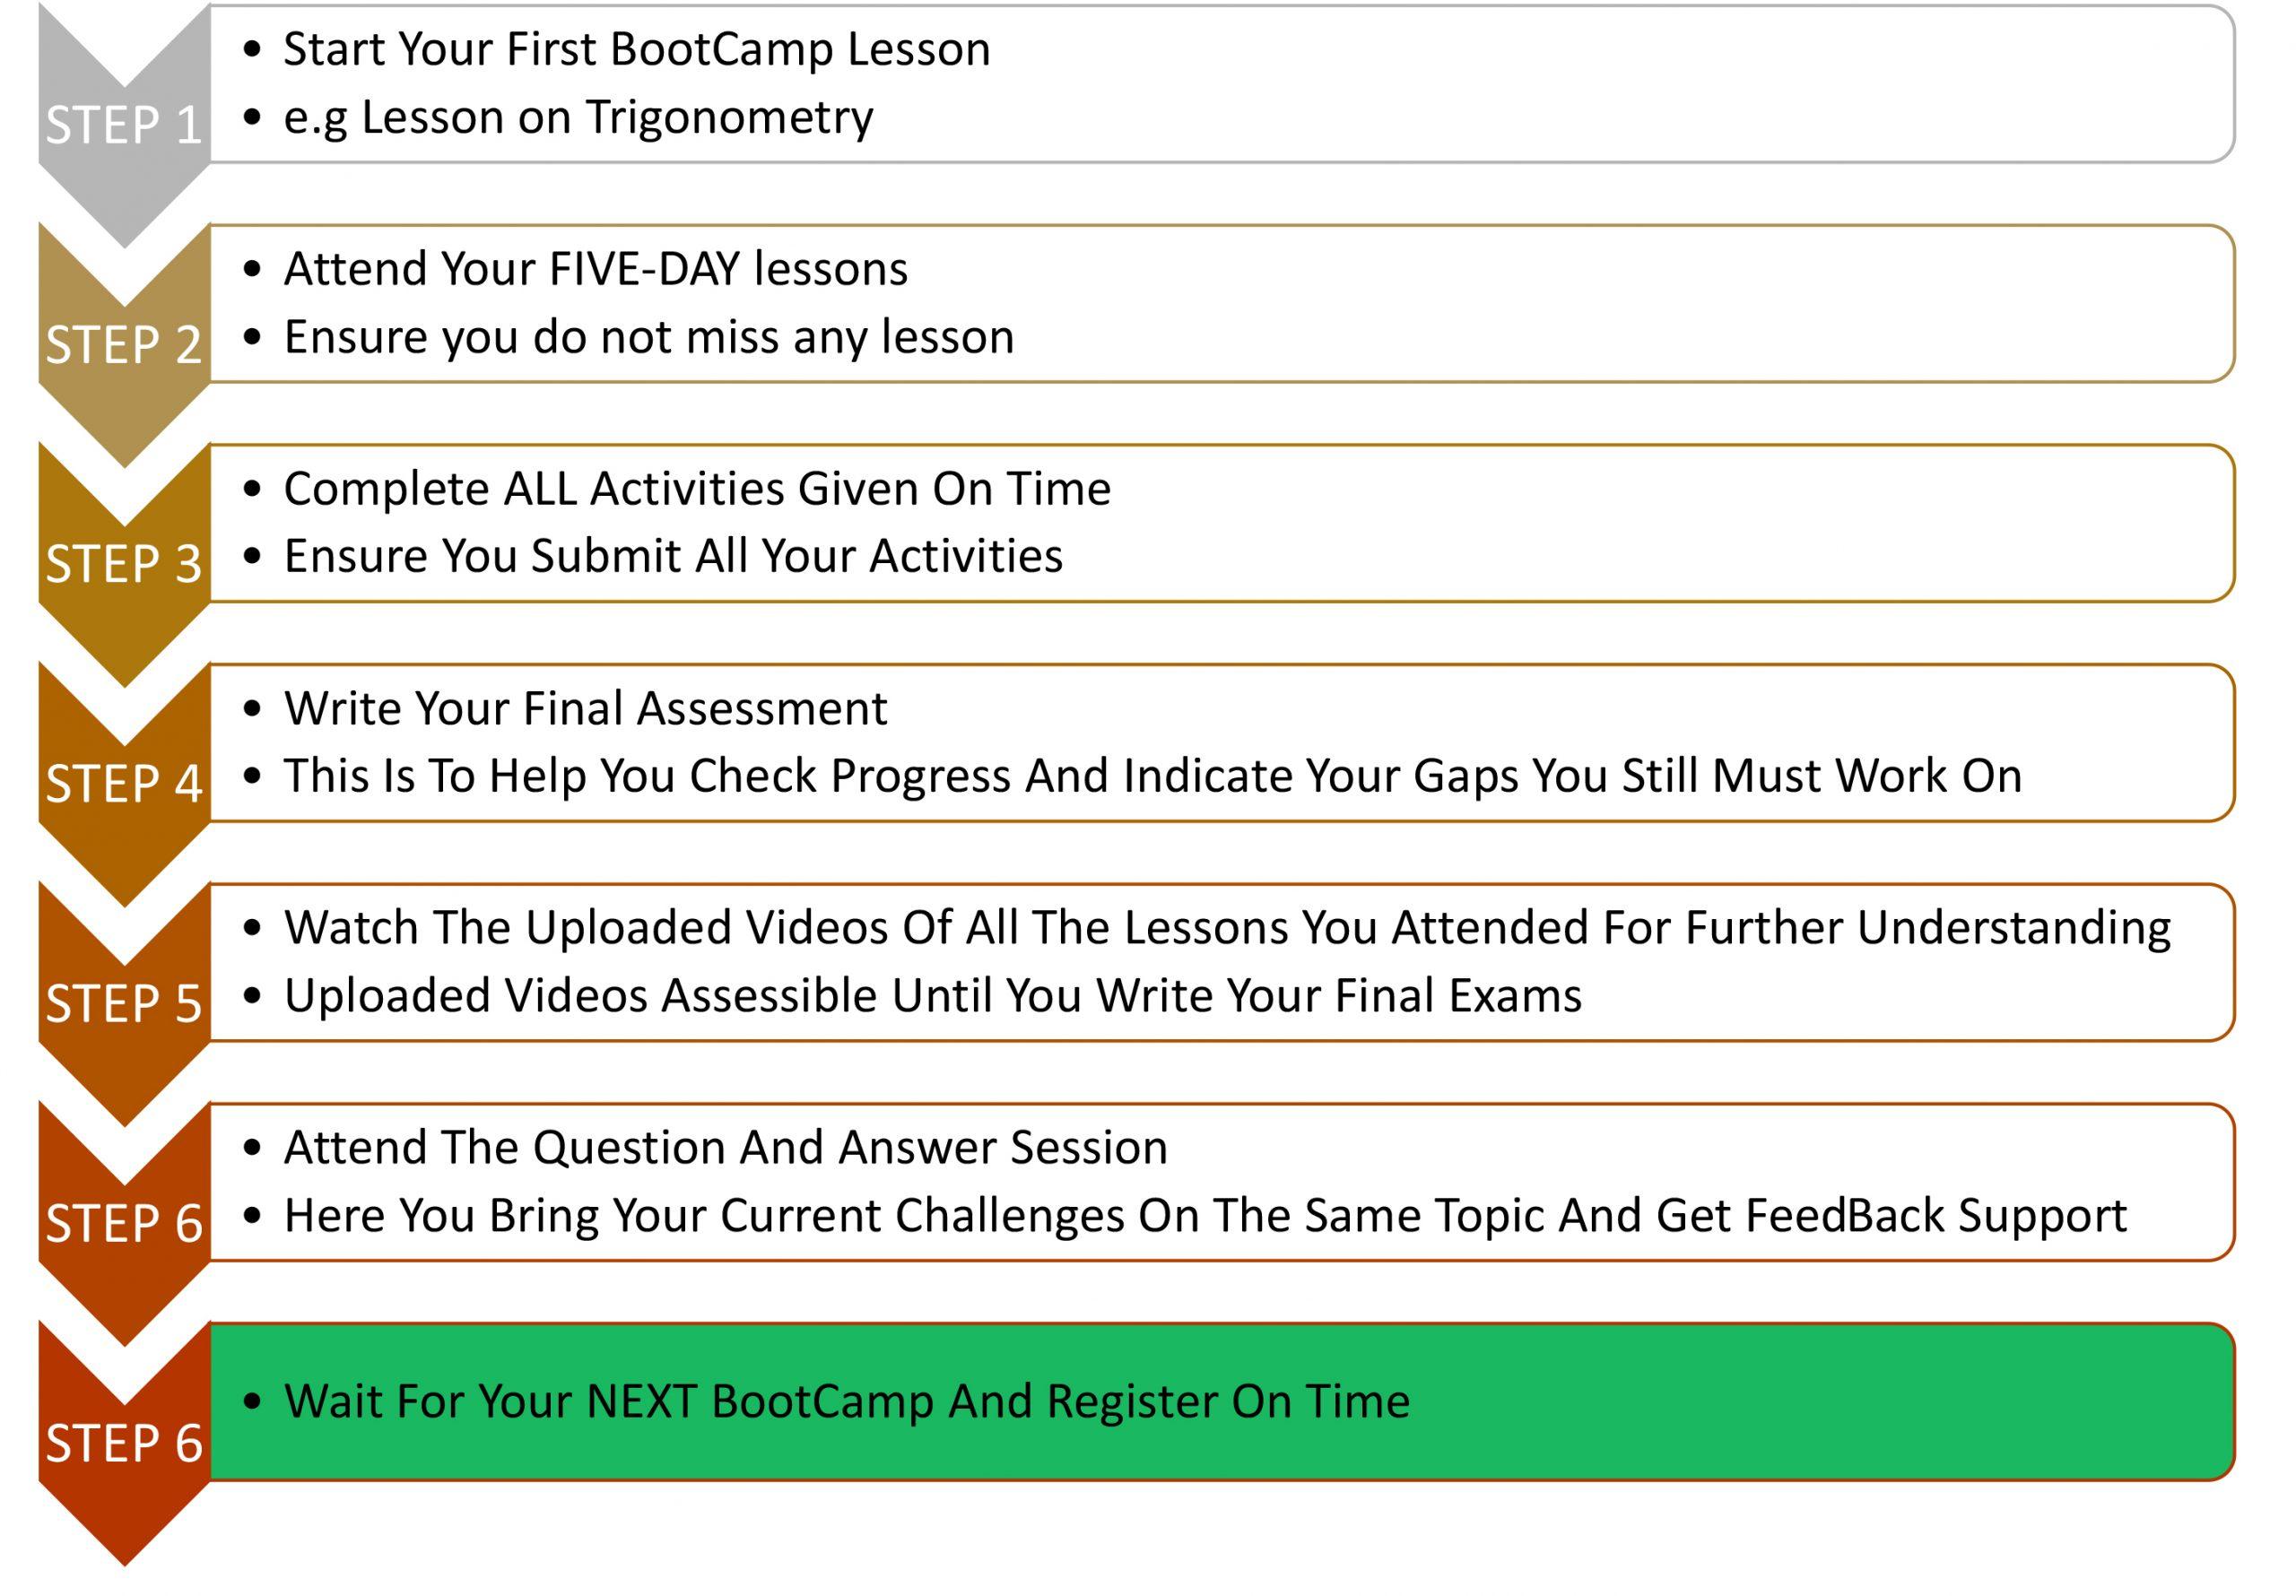 BootCamp Classes